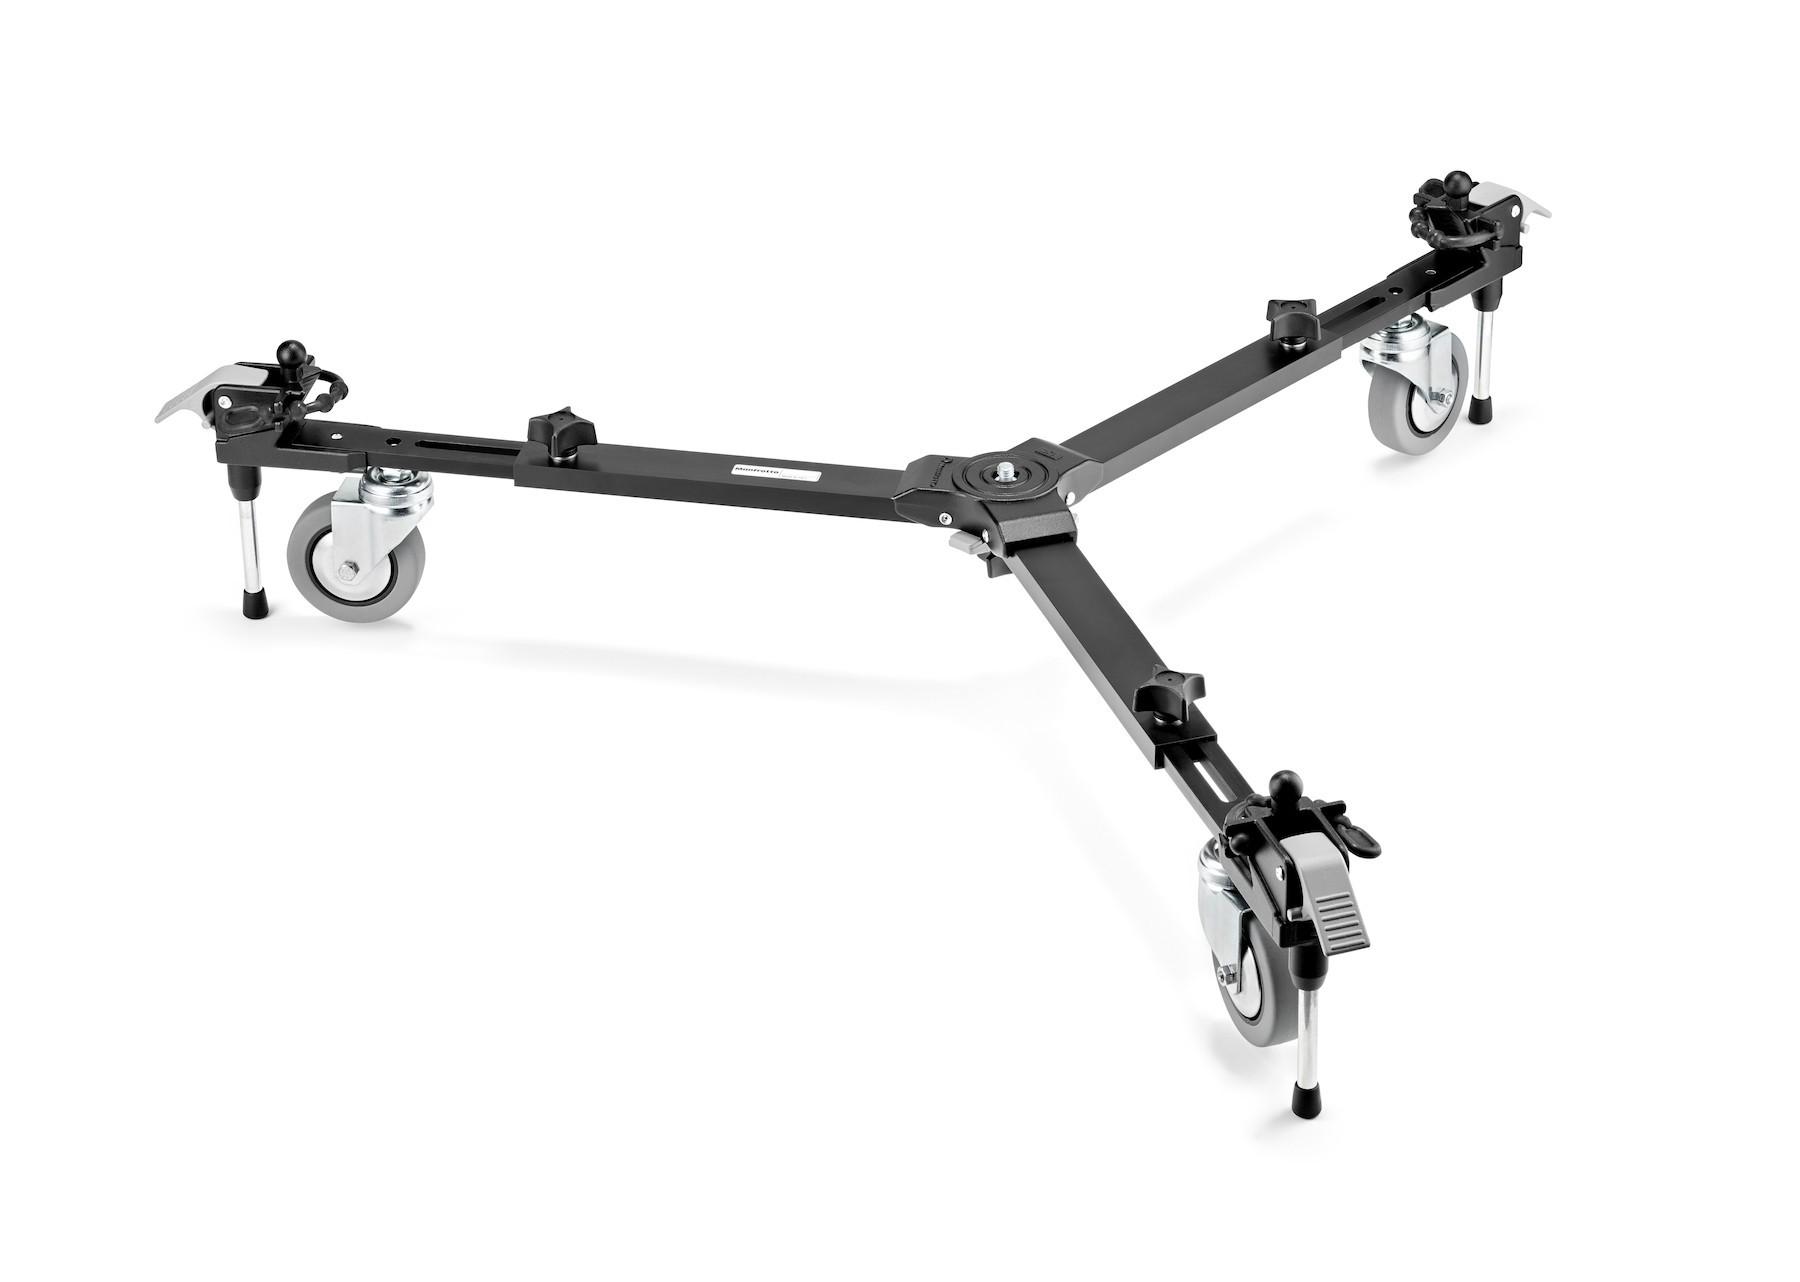 Manfrotto MDOLLYVR - wózek do statywu (VR 360) Manfrotto MDOLLYVR VR 360 - wózek do statywu